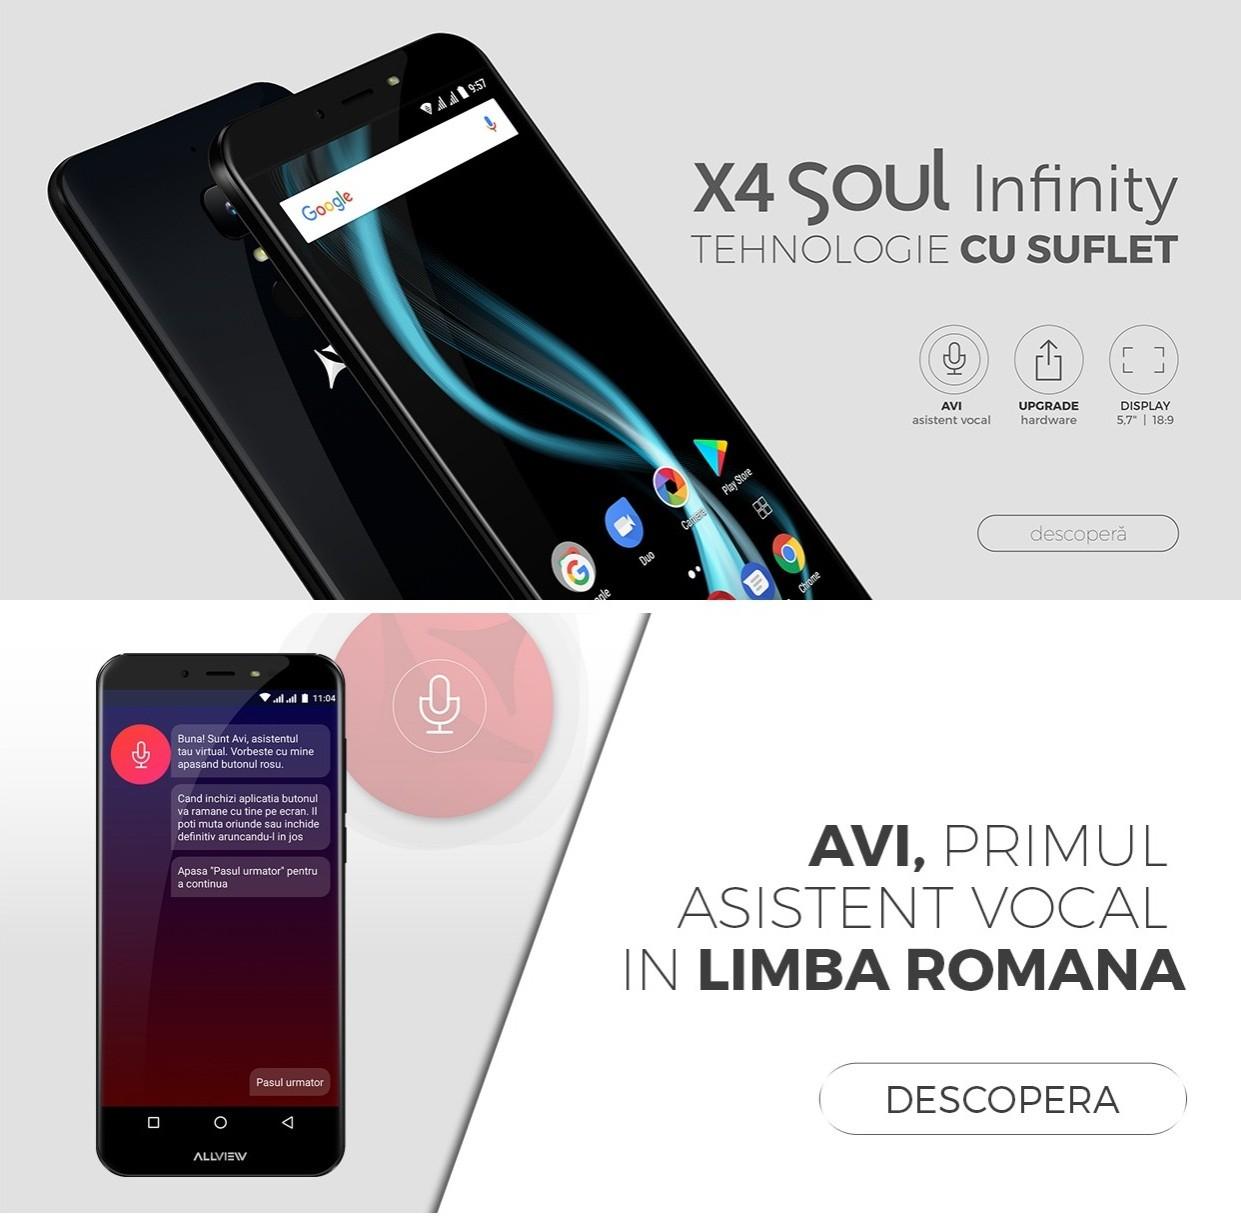 x4-soul-infinity-ne6e3dae26767460a.jpg